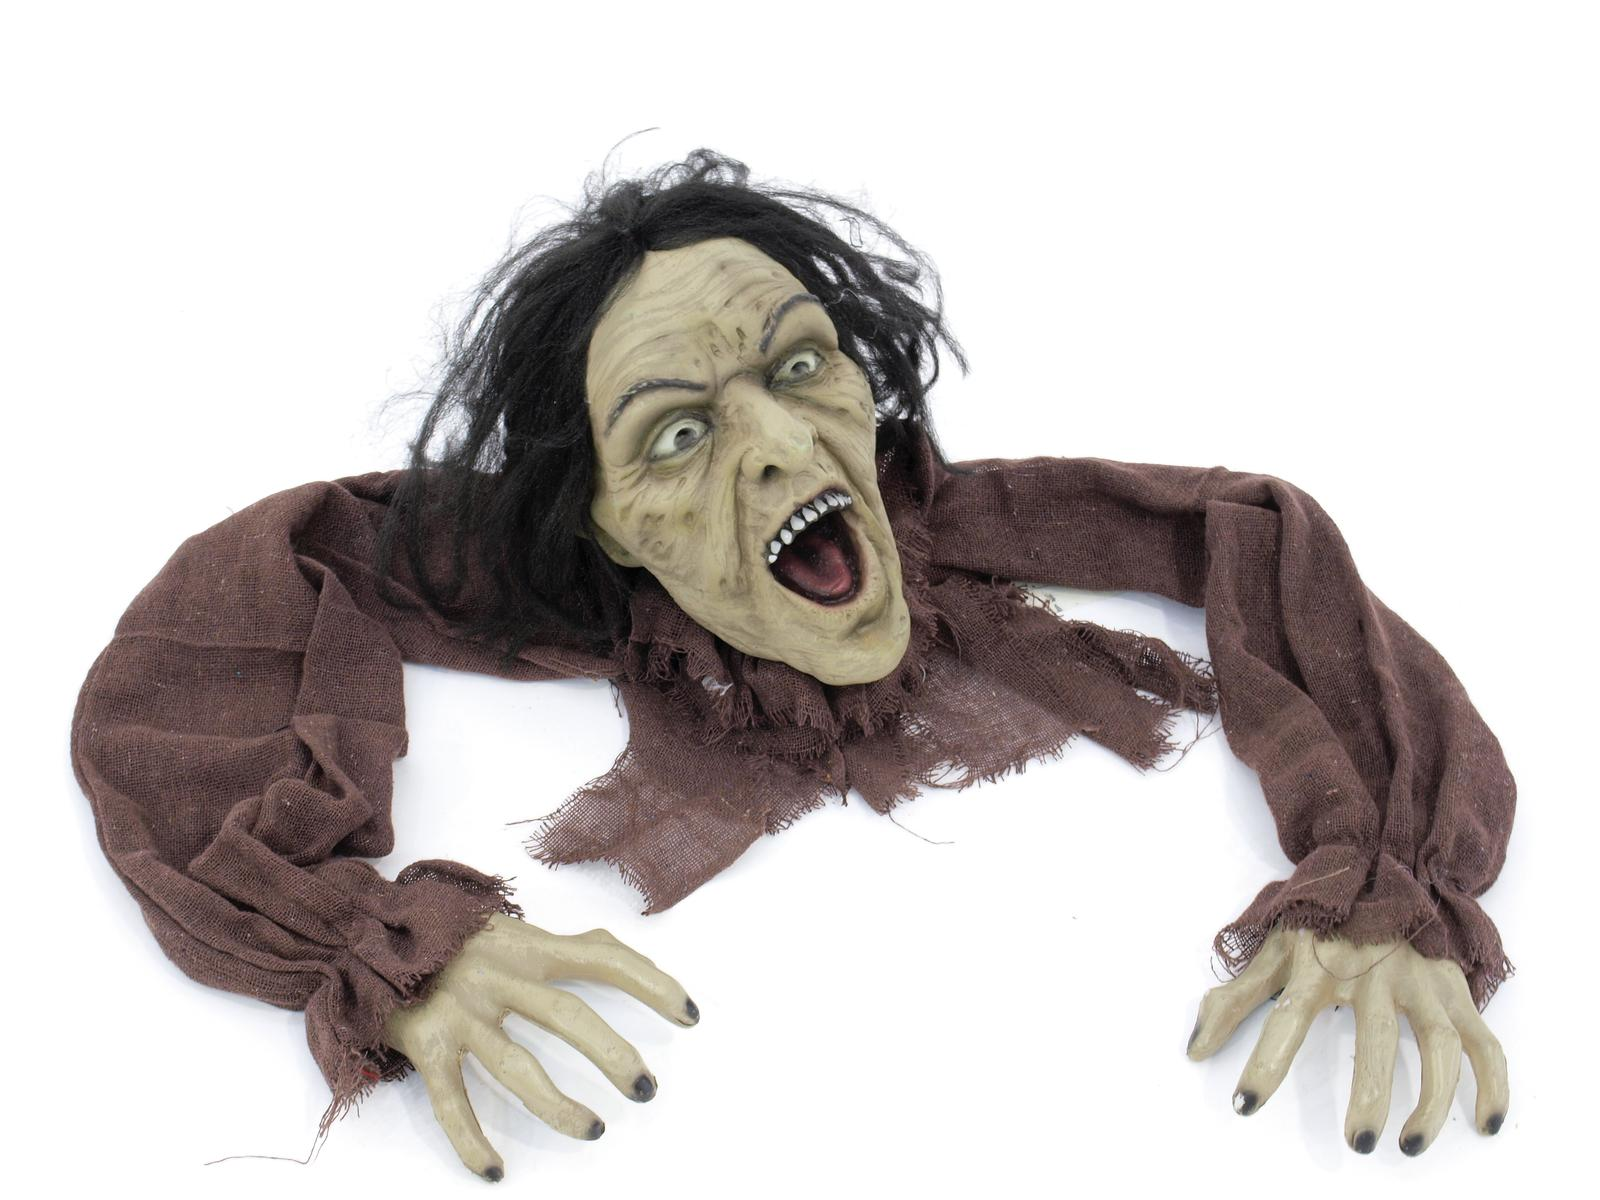 EUROPALMS Halloween Figur Crawling 140cm